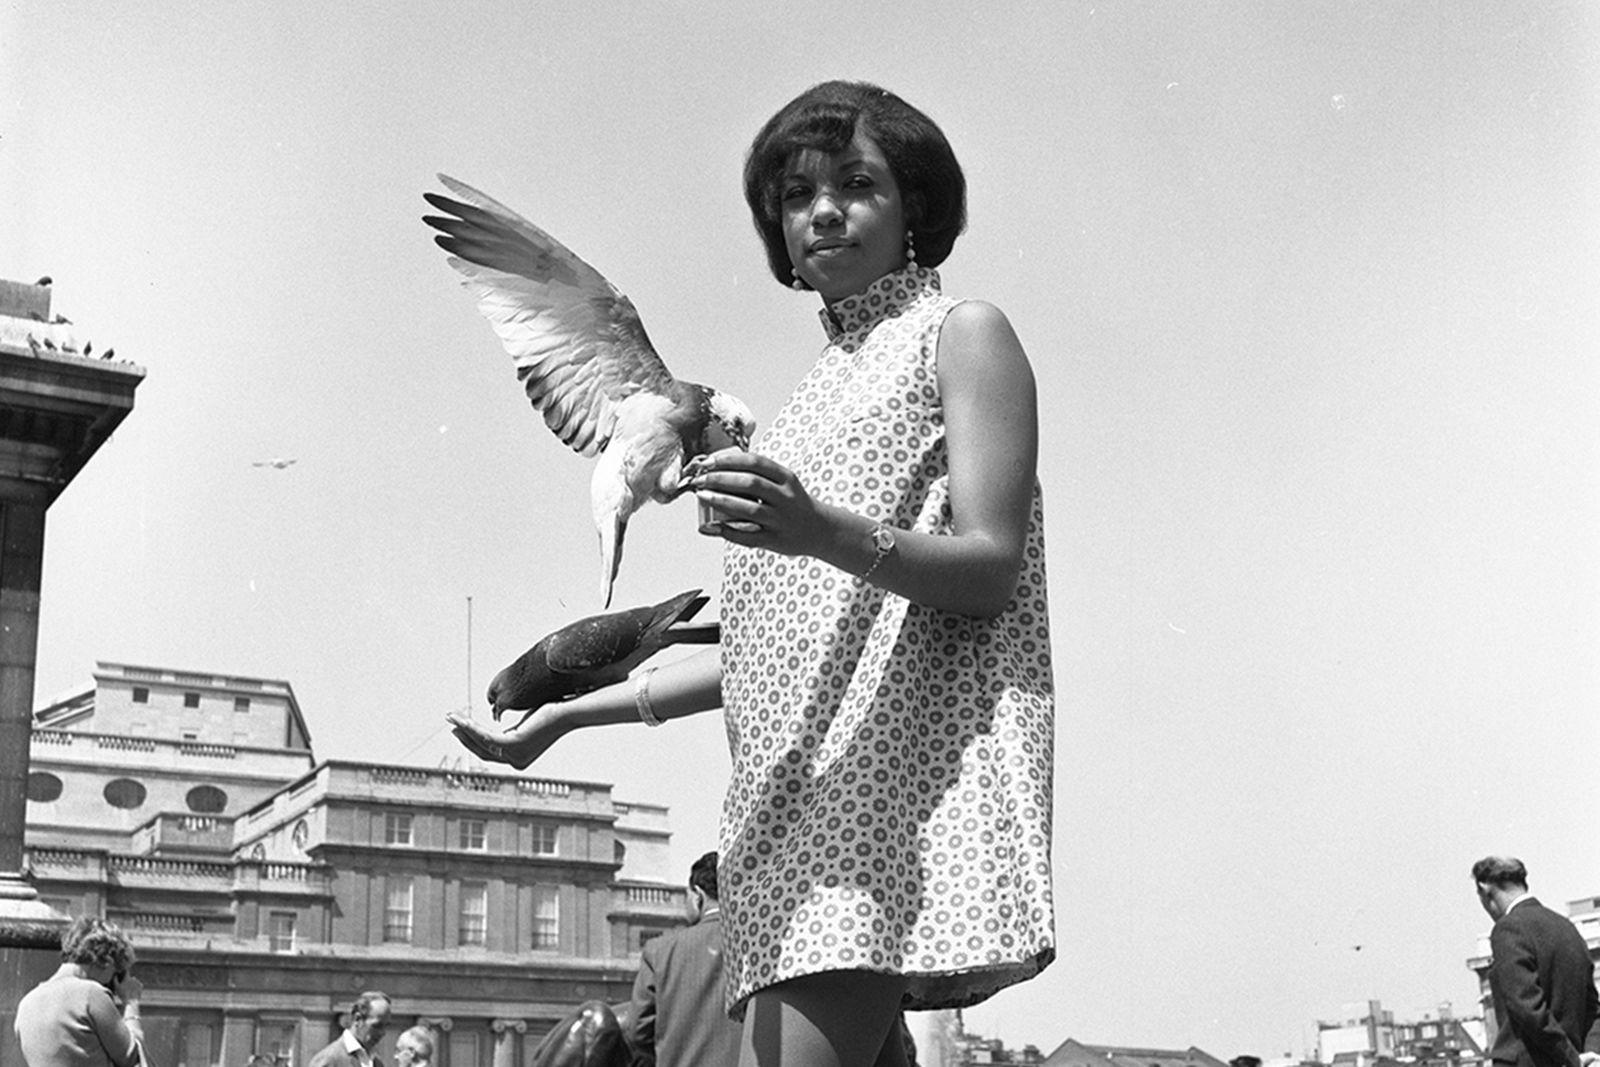 Drum Cover Girl, Erlin Ibreck, at Trafalgar Square, London, 1966. Courtesy Galerie Clémentine de la Féronnière @clementinedelaferonniere